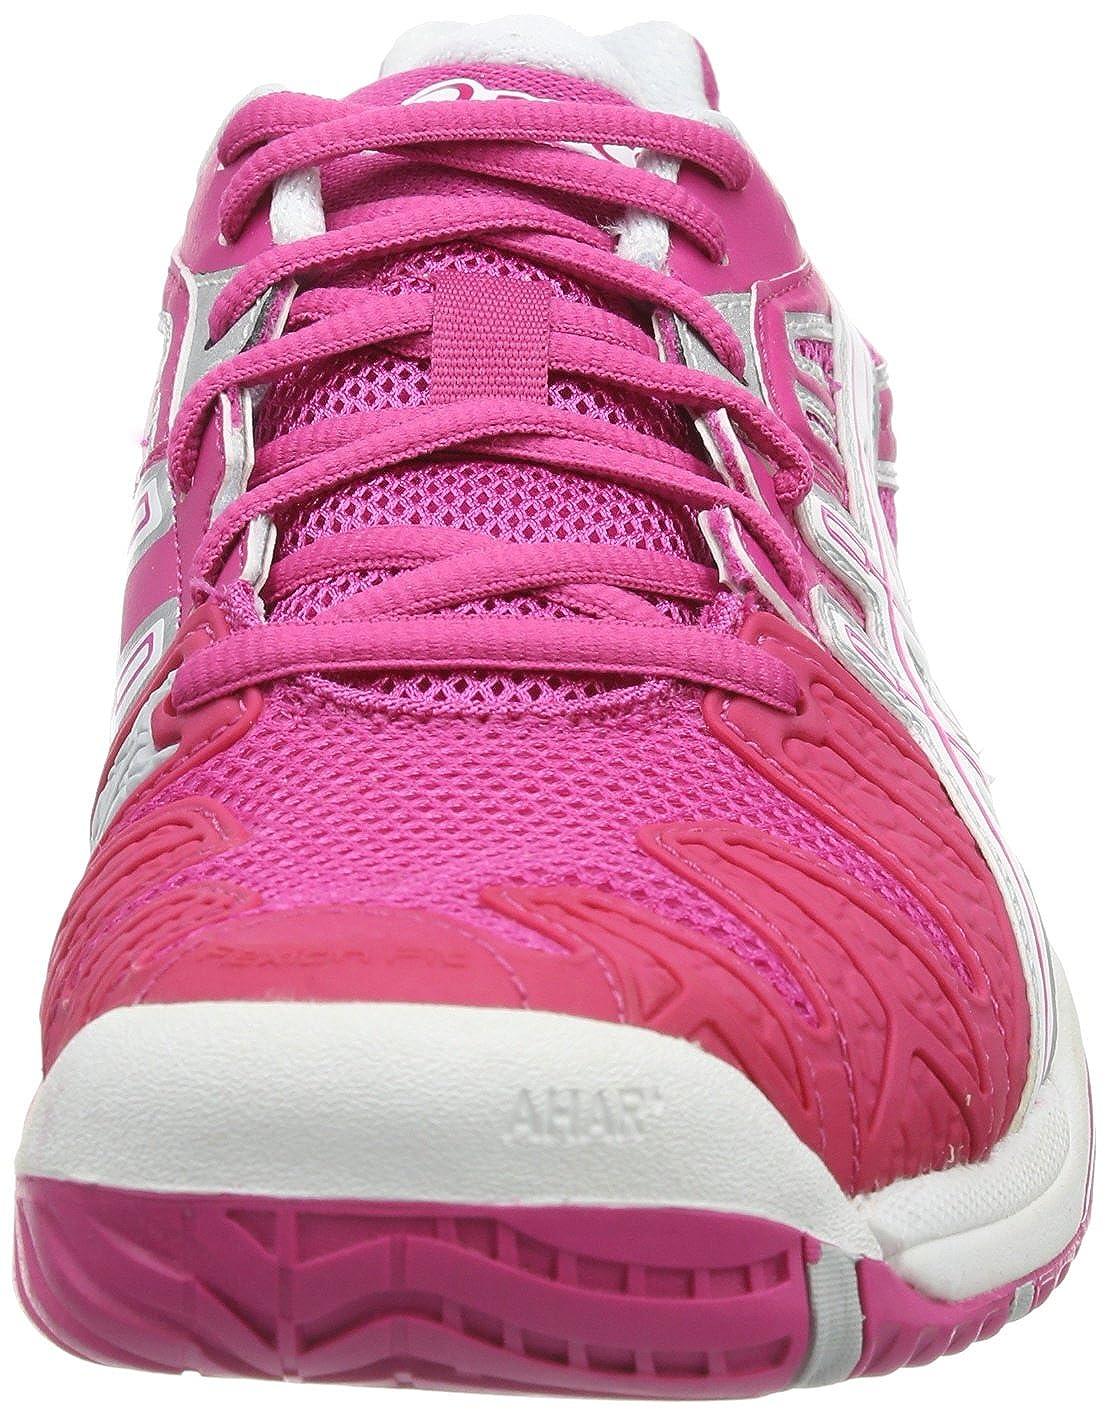 Asics resolution gel resolution Asics 5, scarpe tennis da Asics tennis donna Rosa gel   0cc6ec